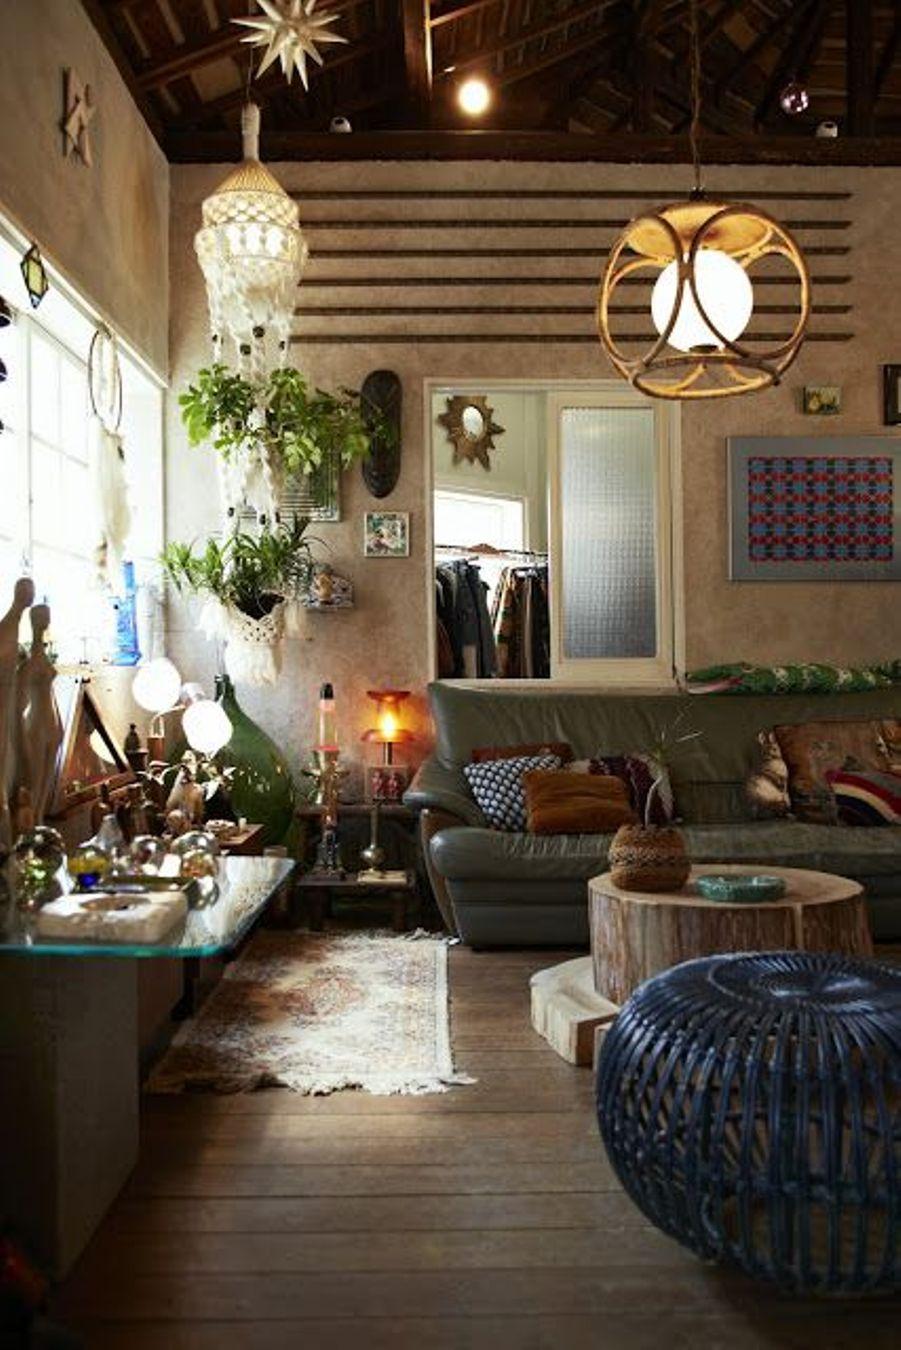 pin on bohemian decor life style on boho chic decor living room bohemian kitchen id=54973